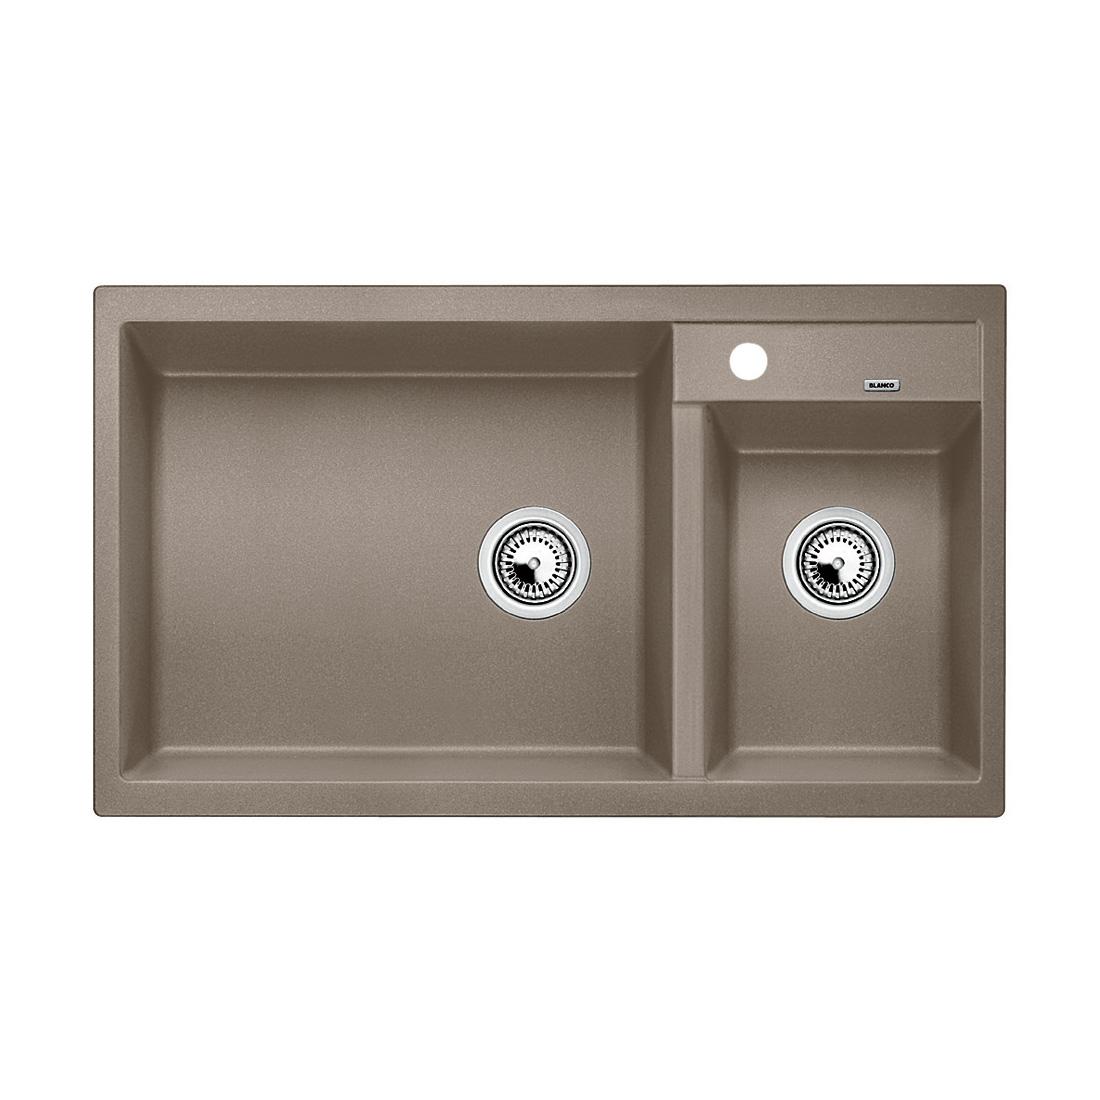 blanco metra 9 sp le b 86 t 50 cm becken silgranit puradur ii tartufo 517364 reuter. Black Bedroom Furniture Sets. Home Design Ideas